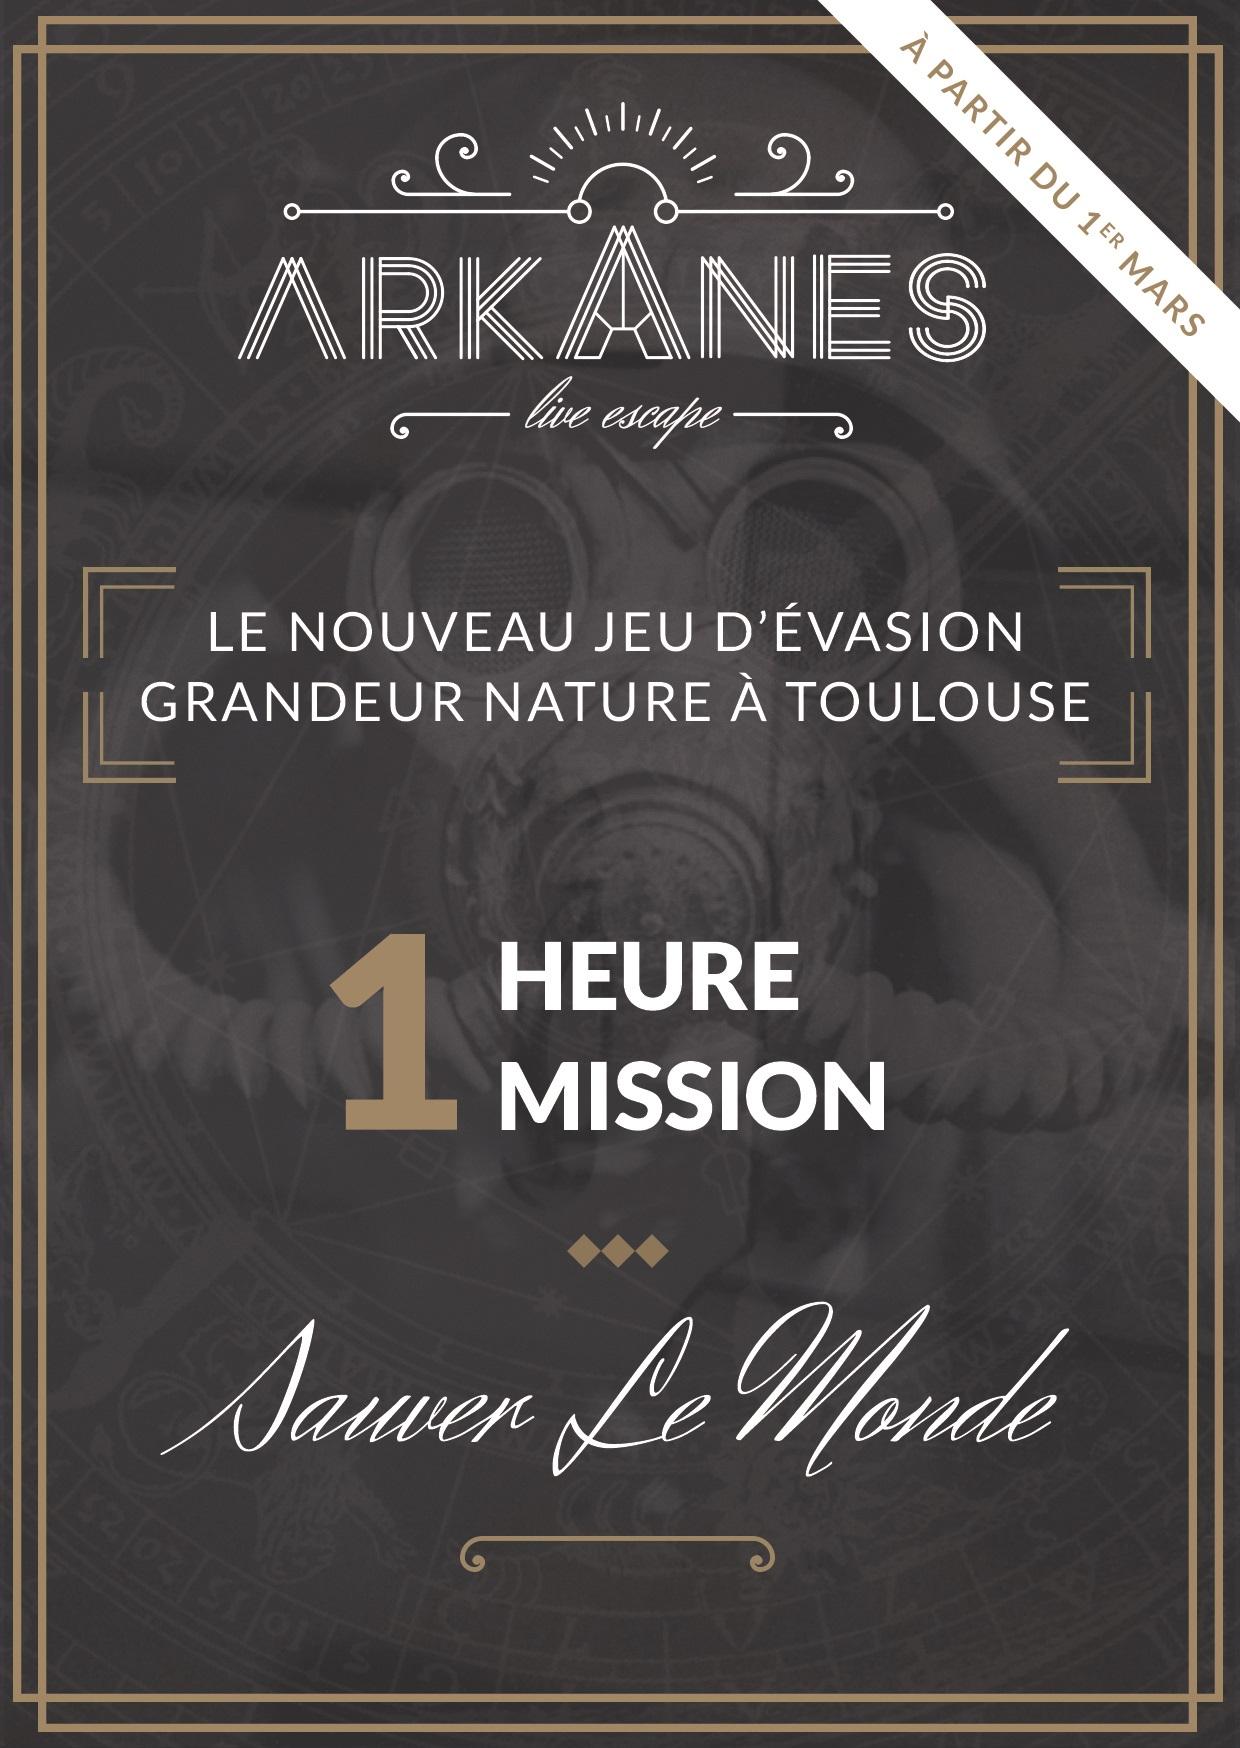 arkanes live escape toulouse escape game avis promo. Black Bedroom Furniture Sets. Home Design Ideas